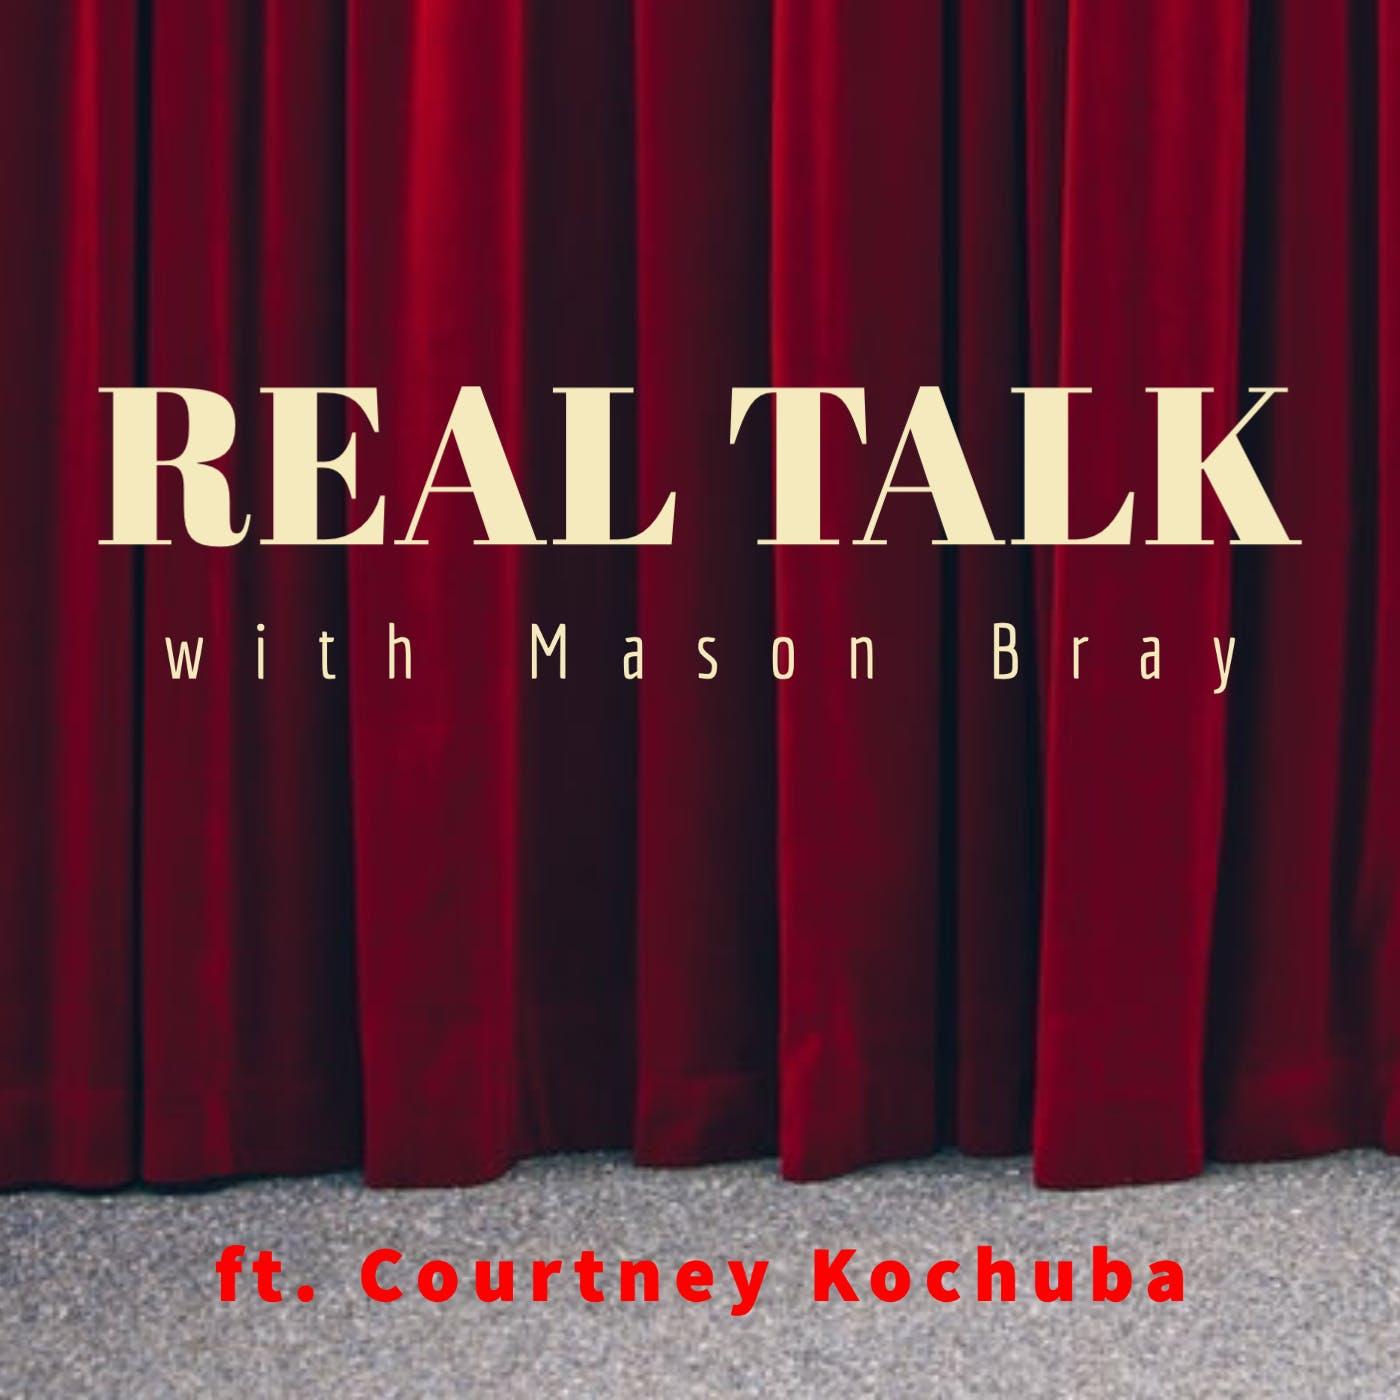 Ep. 505 - BROADWAY TALKS with a Marketing Director - Courtney Kochuba